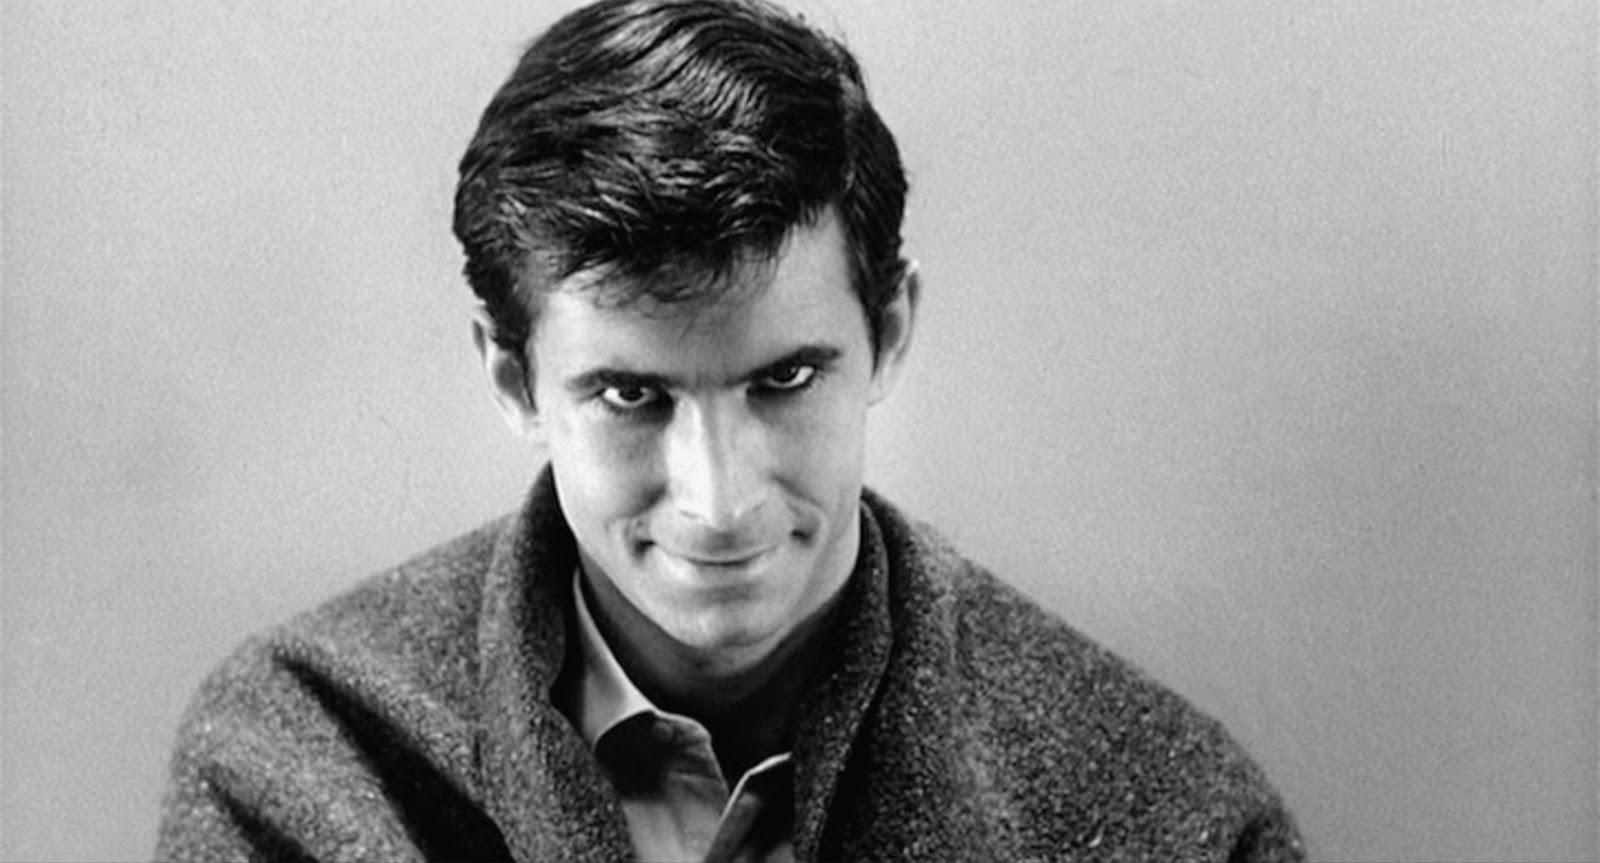 ABD'li aktör Anthony Perkins tarihte bugün